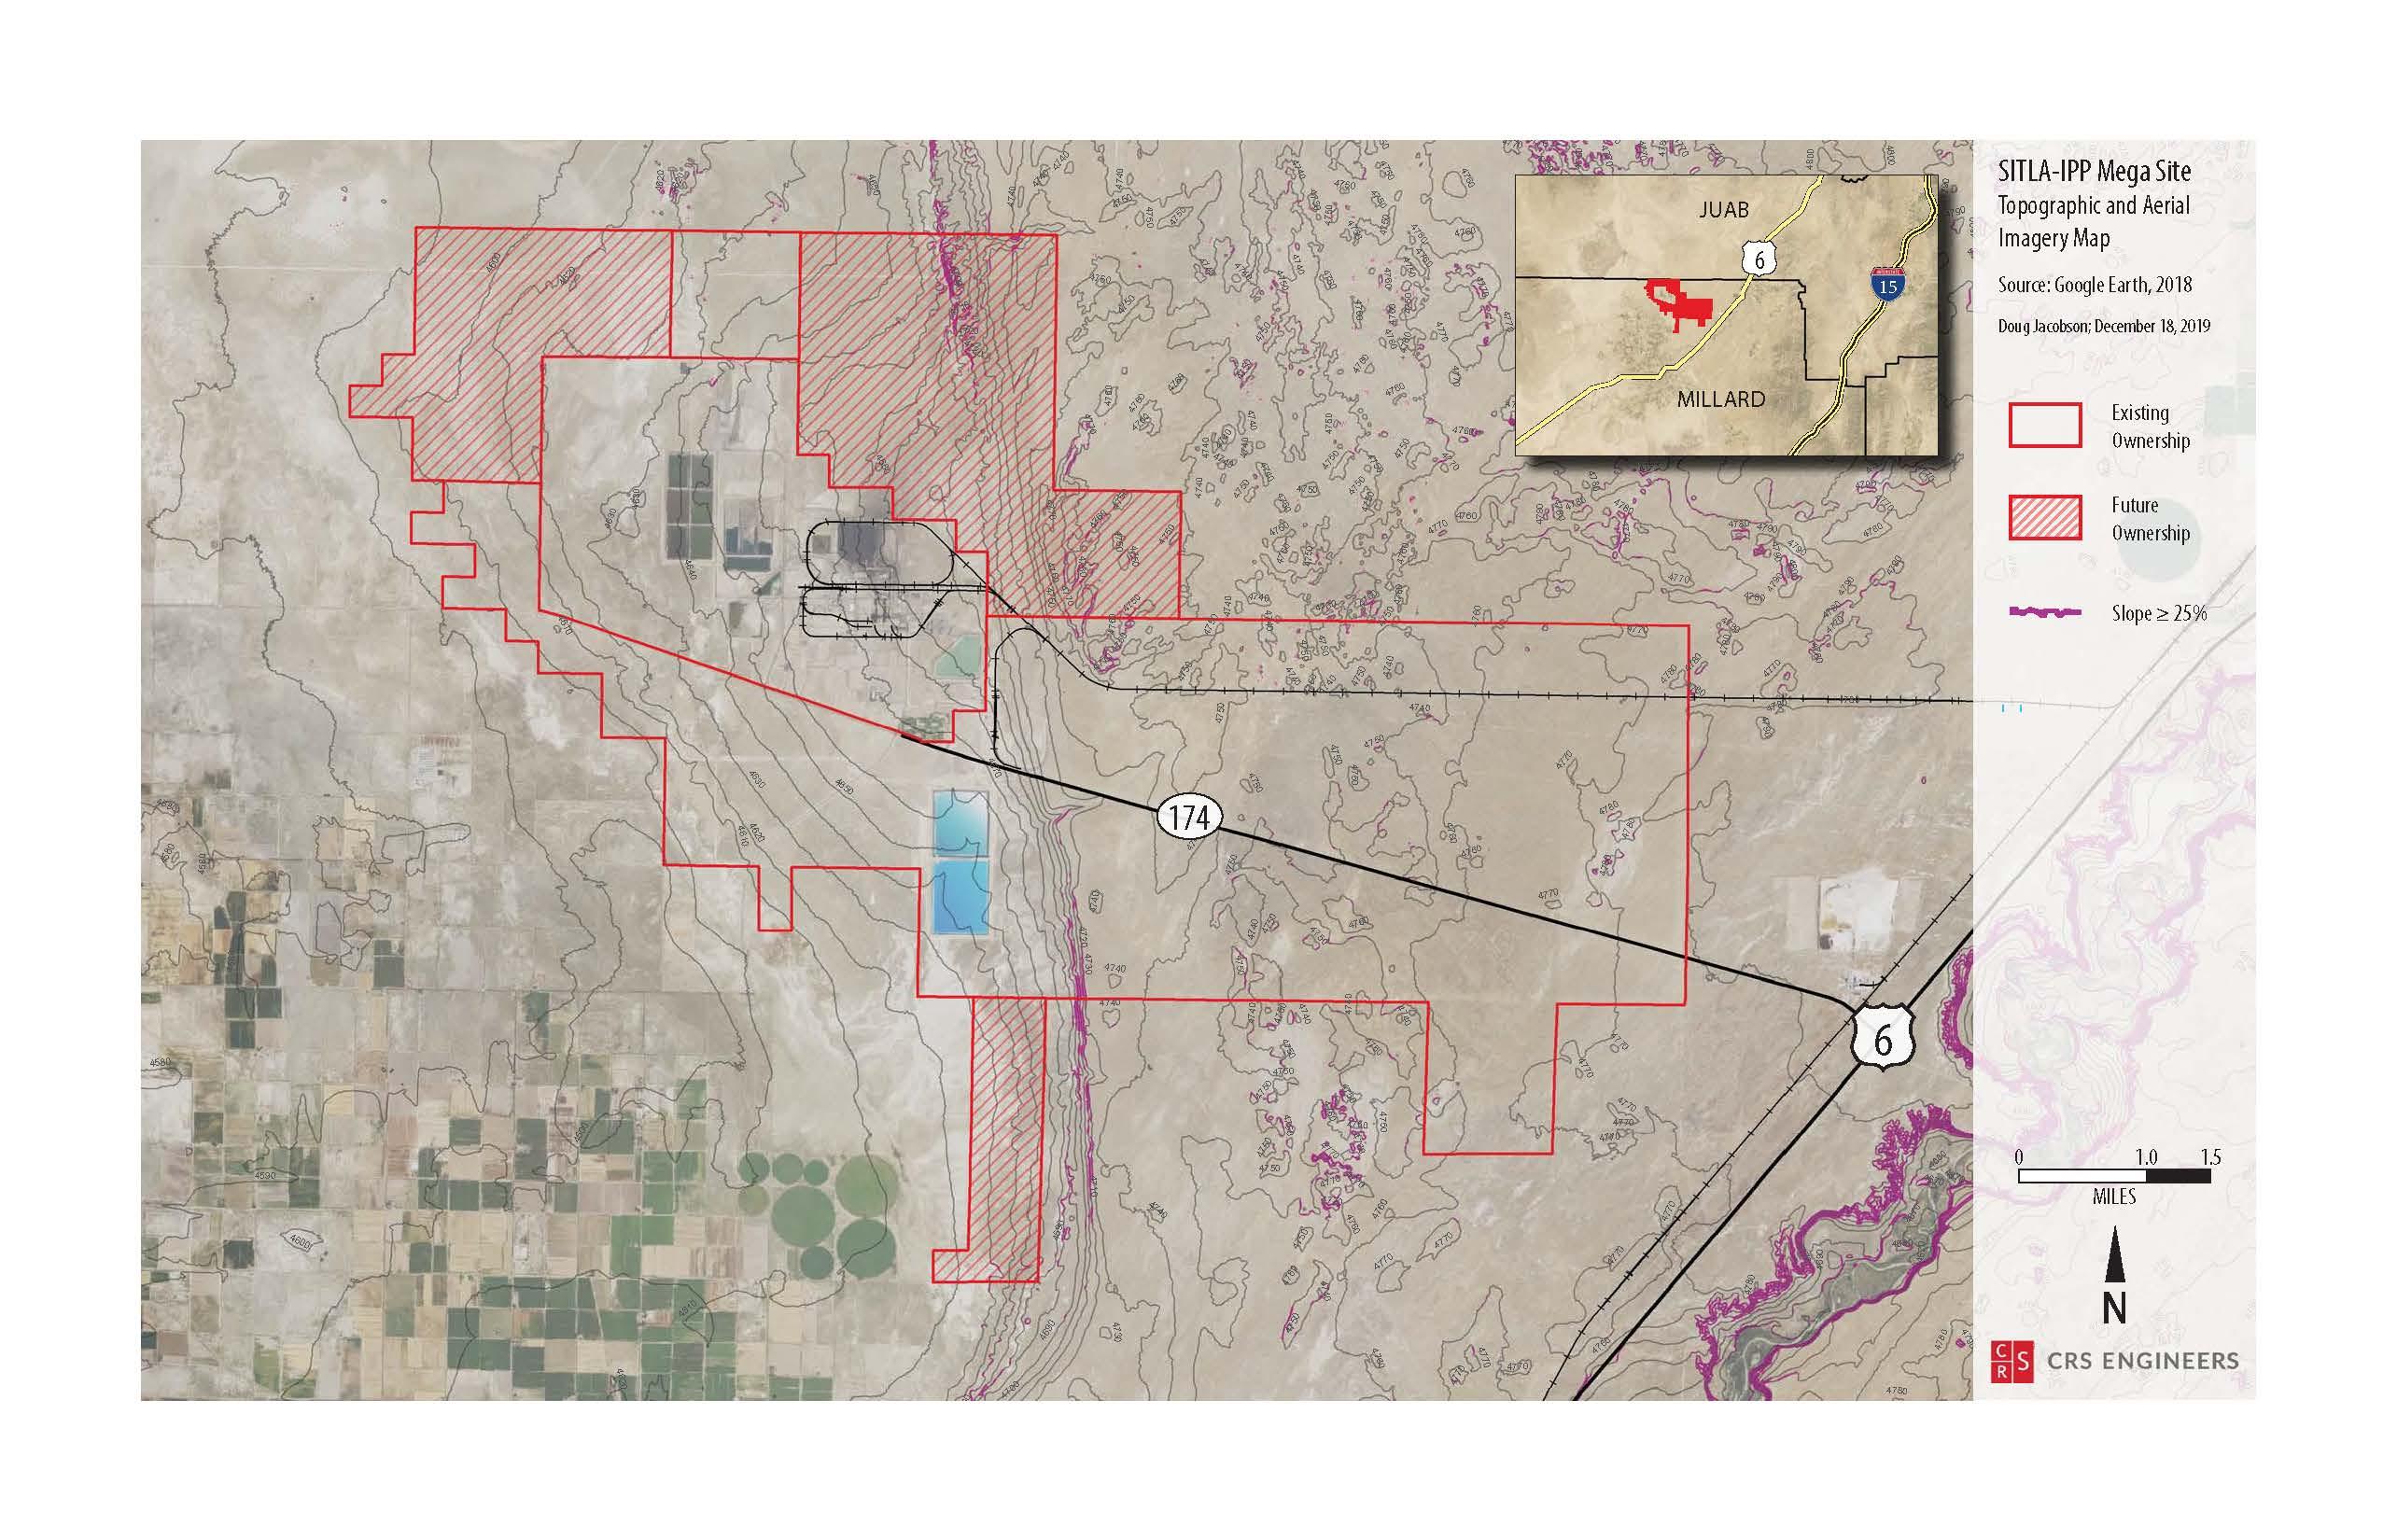 Millard County Mega Site